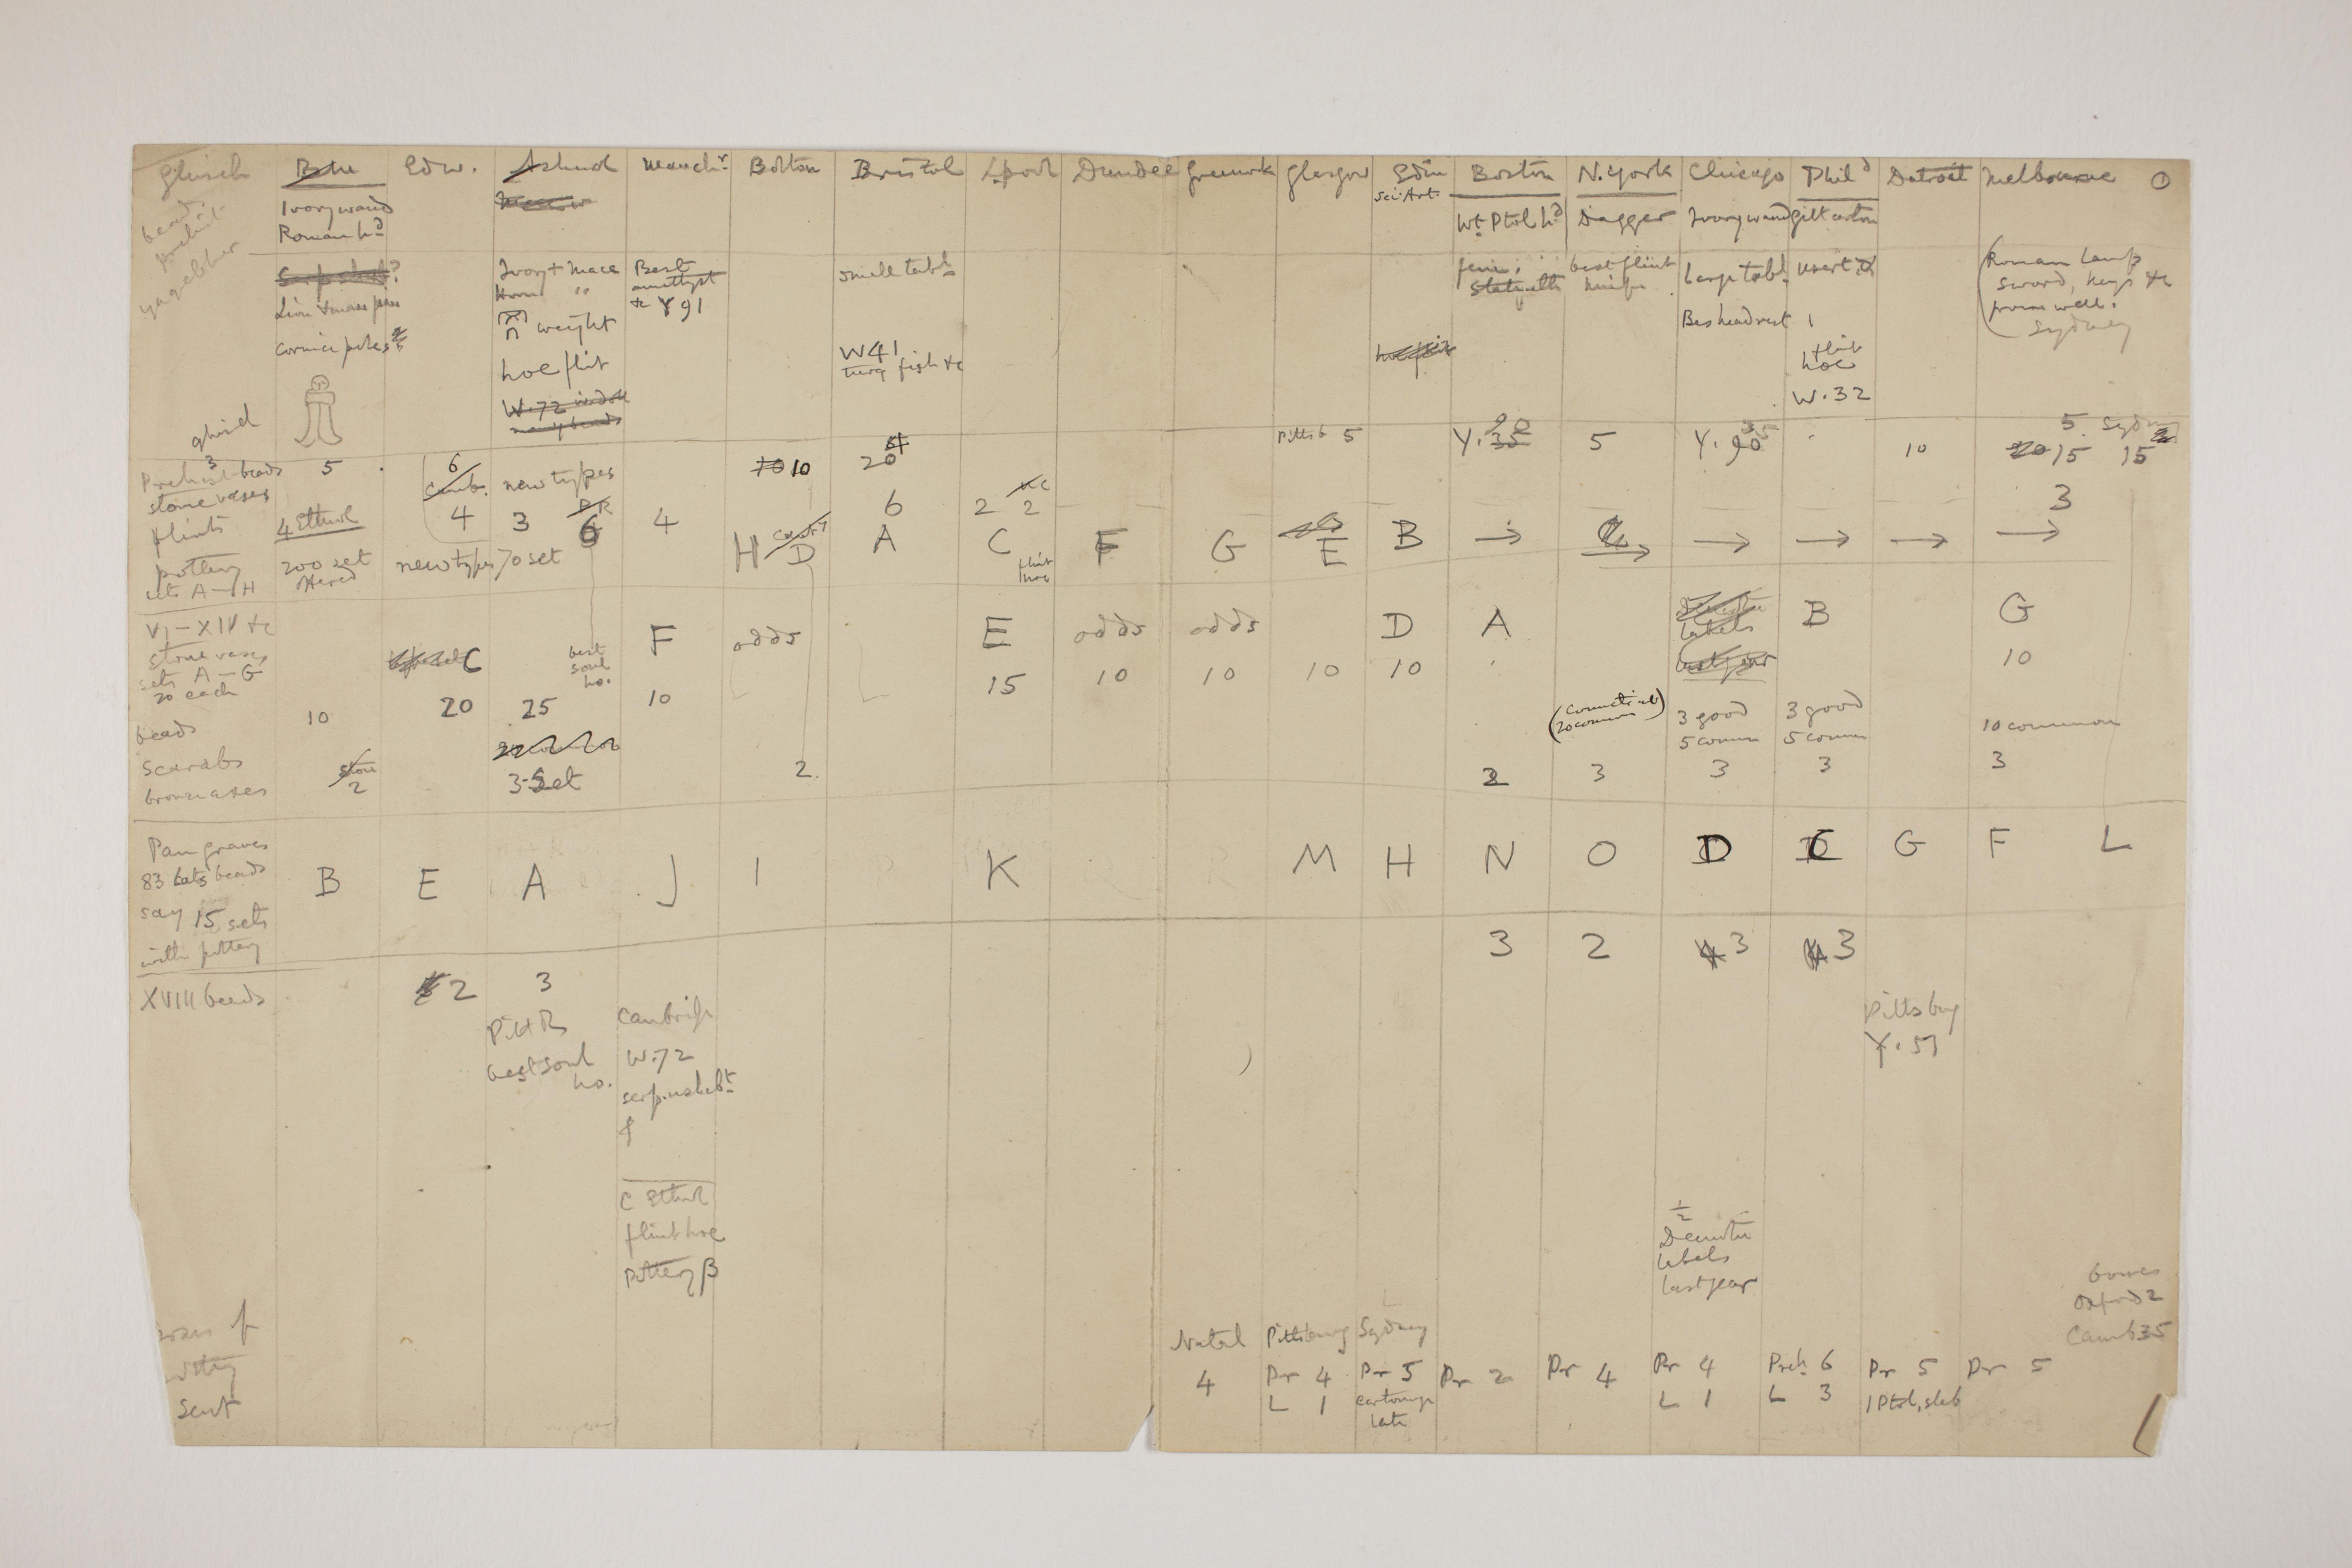 1898-99 Hu, Faiyum, Deir el-Bahri Multiple institution list PMA/WFP1/D/7/1.1